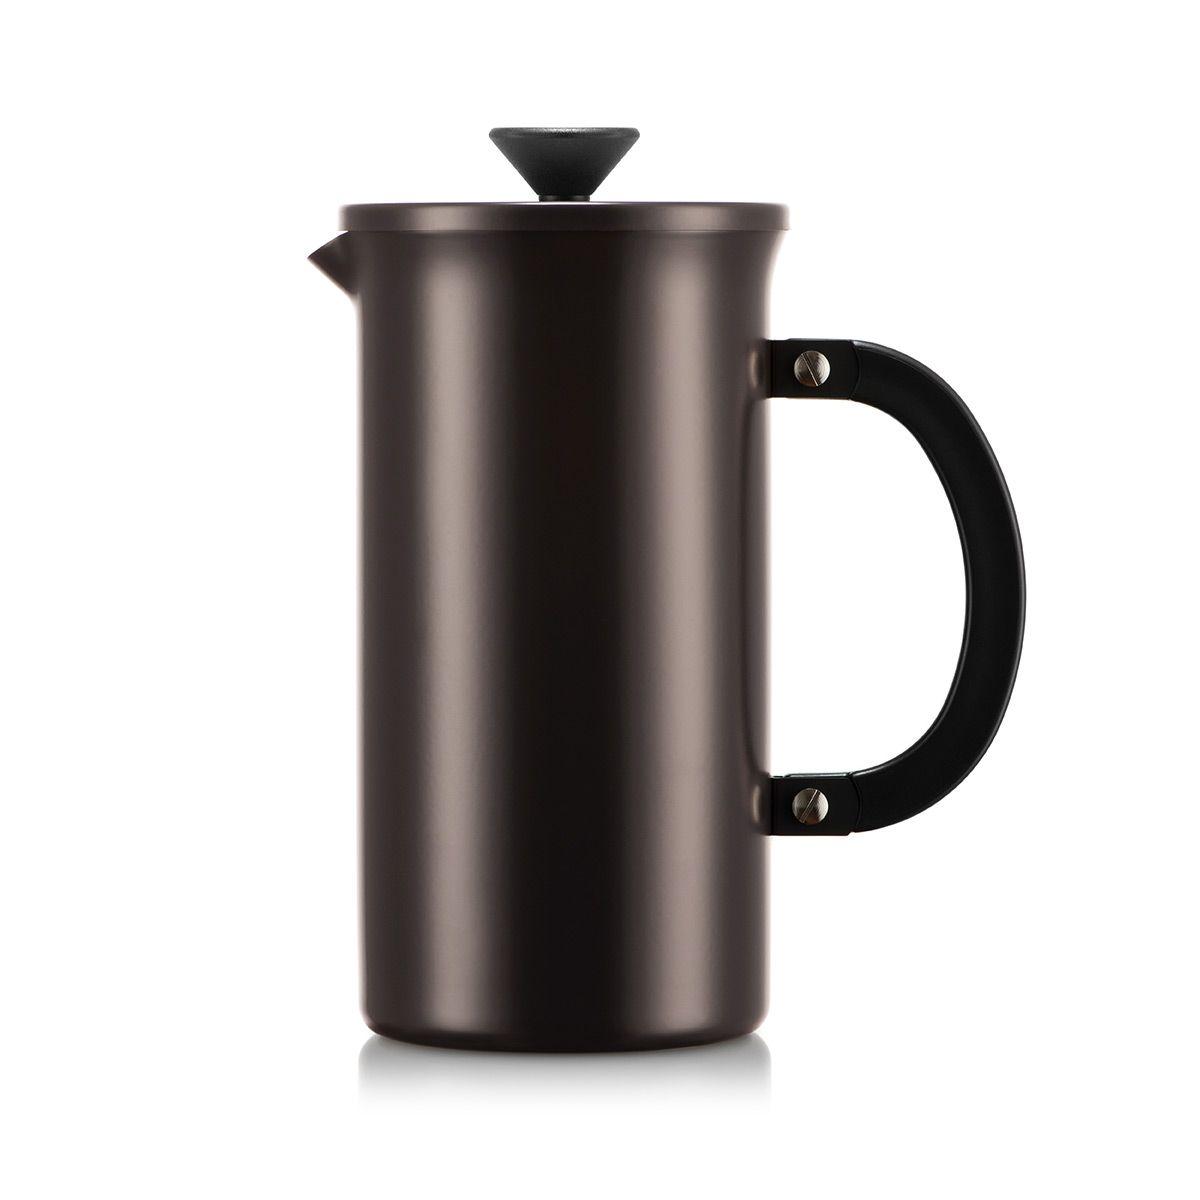 Coffee Maker TRIBUTE Bodum